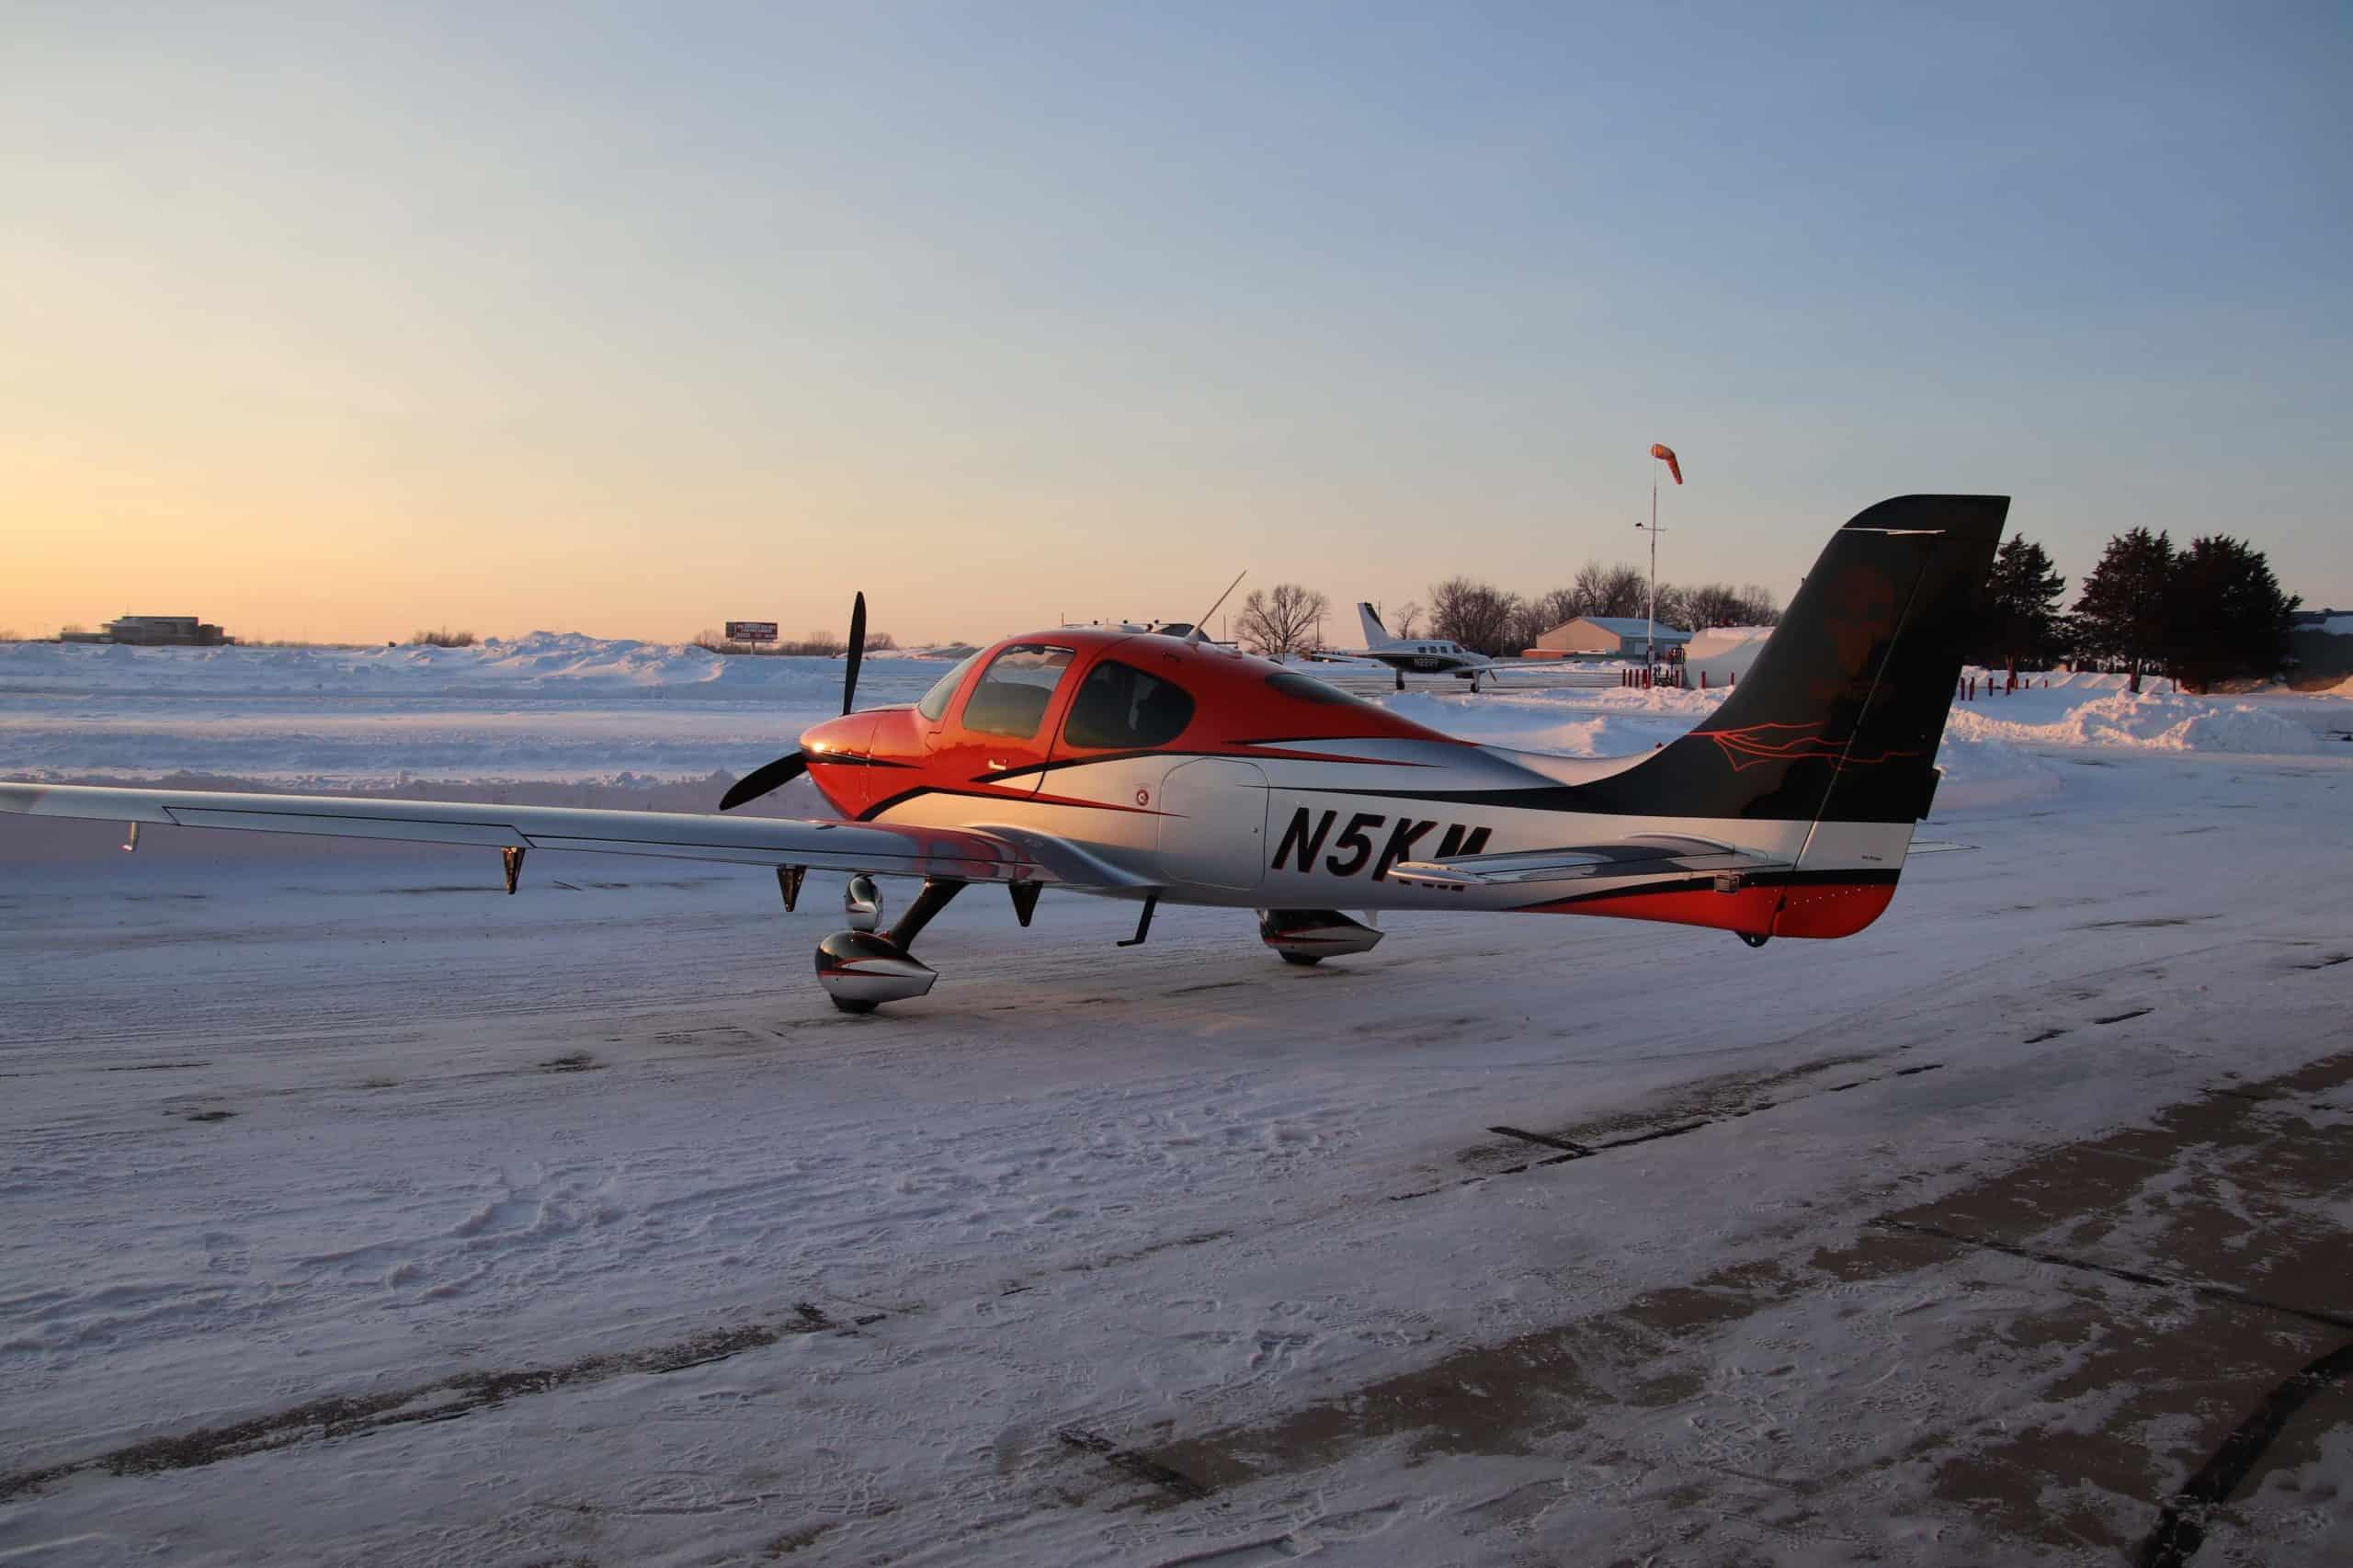 Aircraft Exterior refinishing